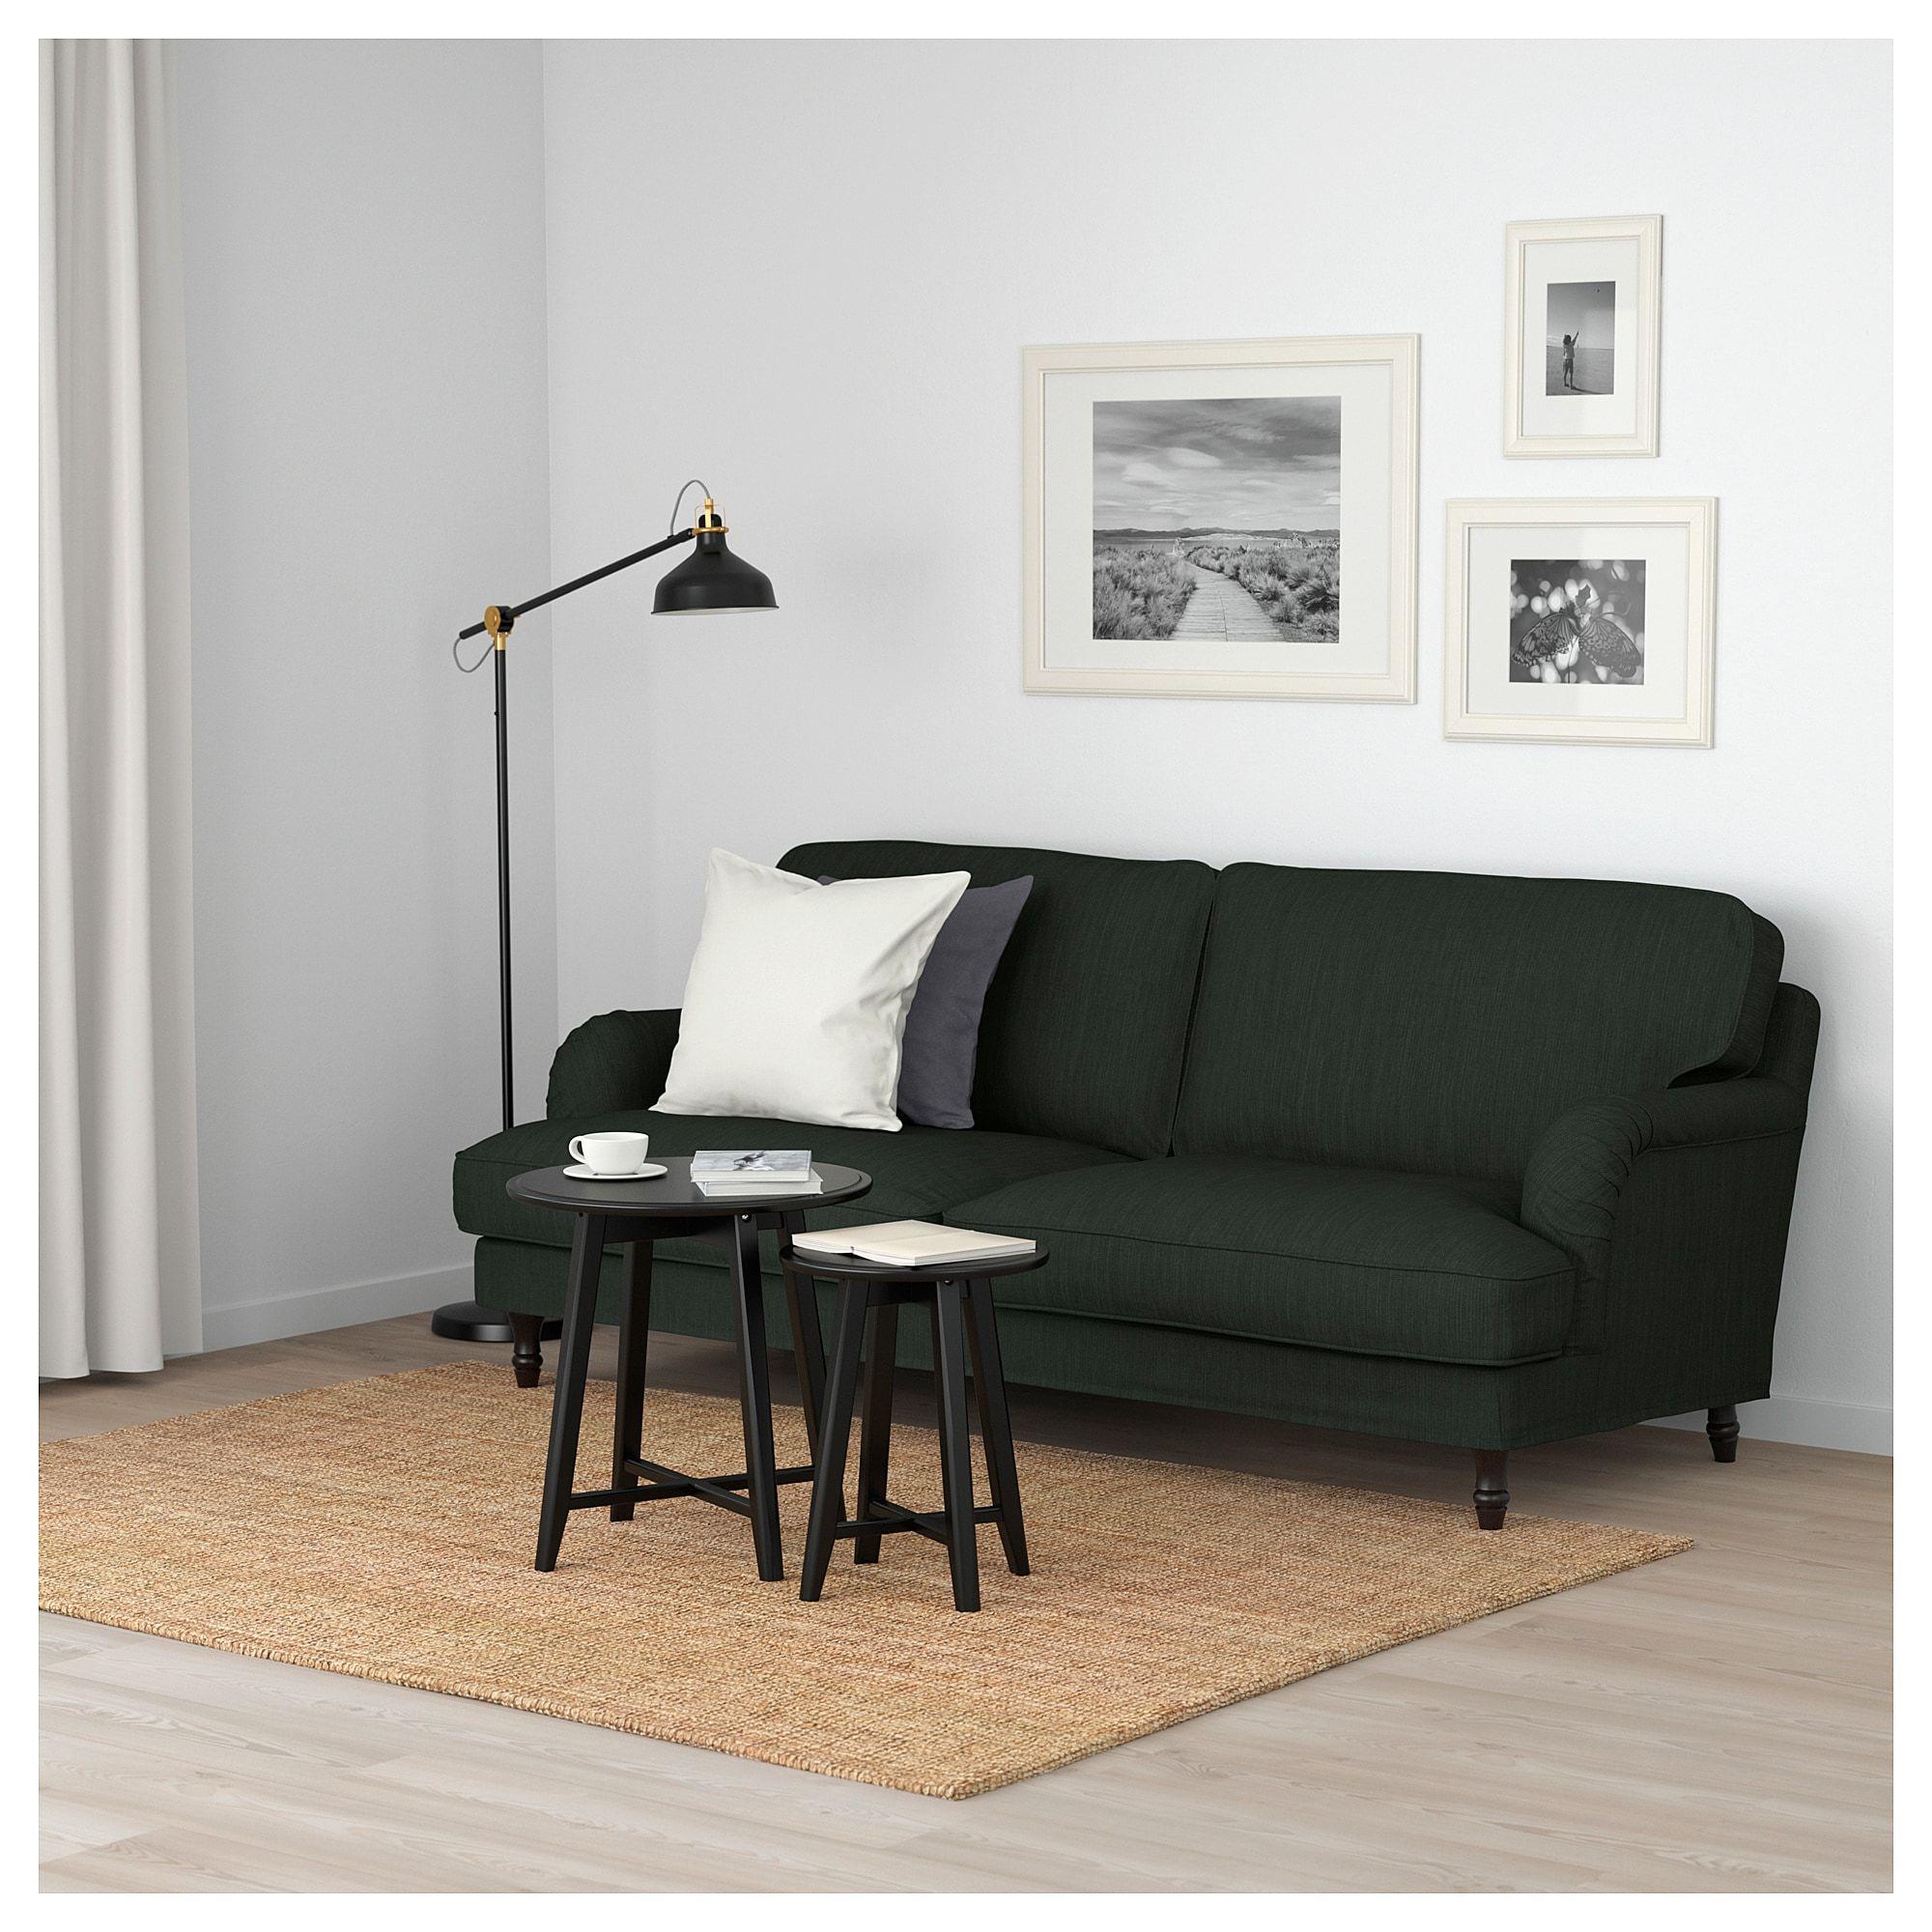 Stocksund Sofa Nolhaga Dark Green Black Wood Stocksund Sofa